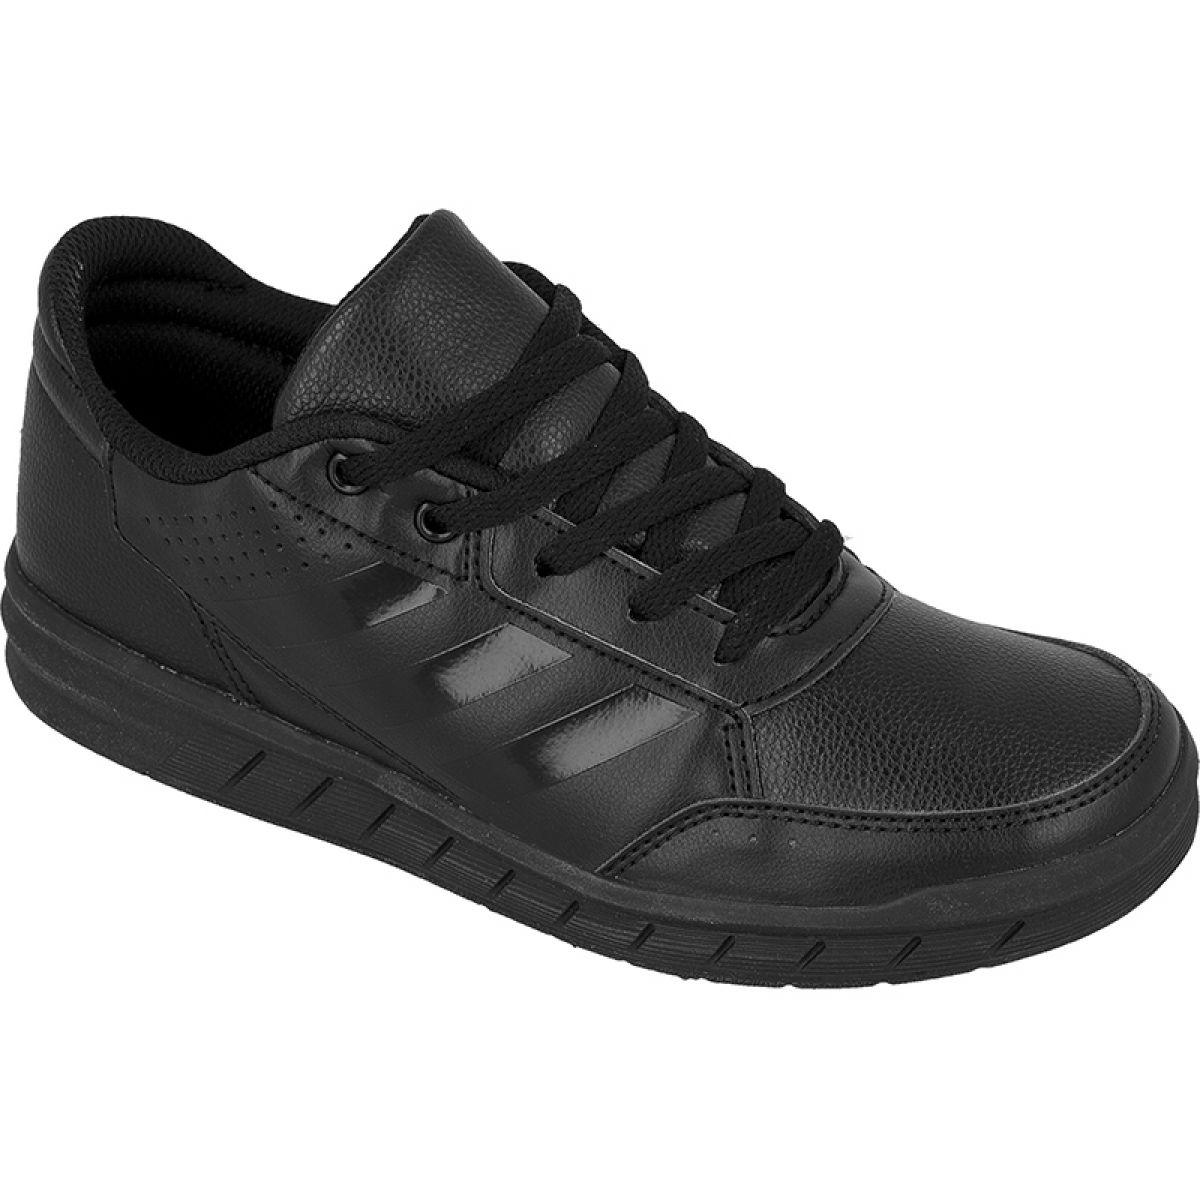 Adidas AltaSport K Jr. D96873 skor svart